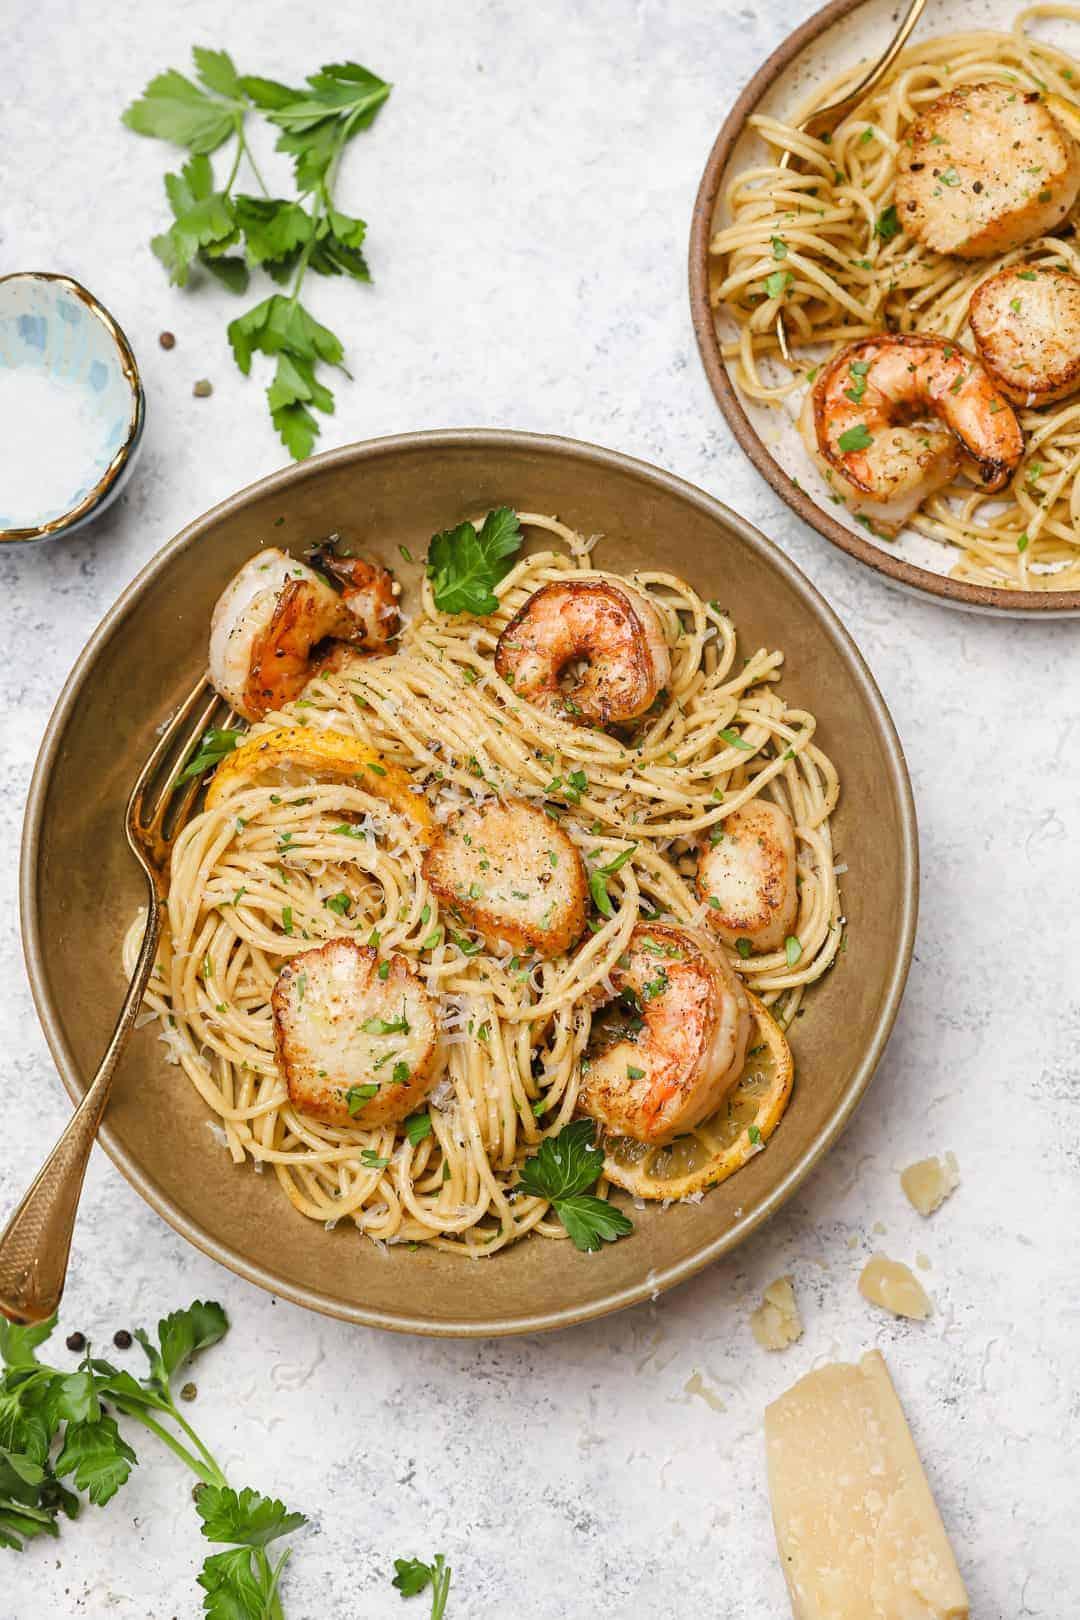 Shrimp and scallops pasta with lemon